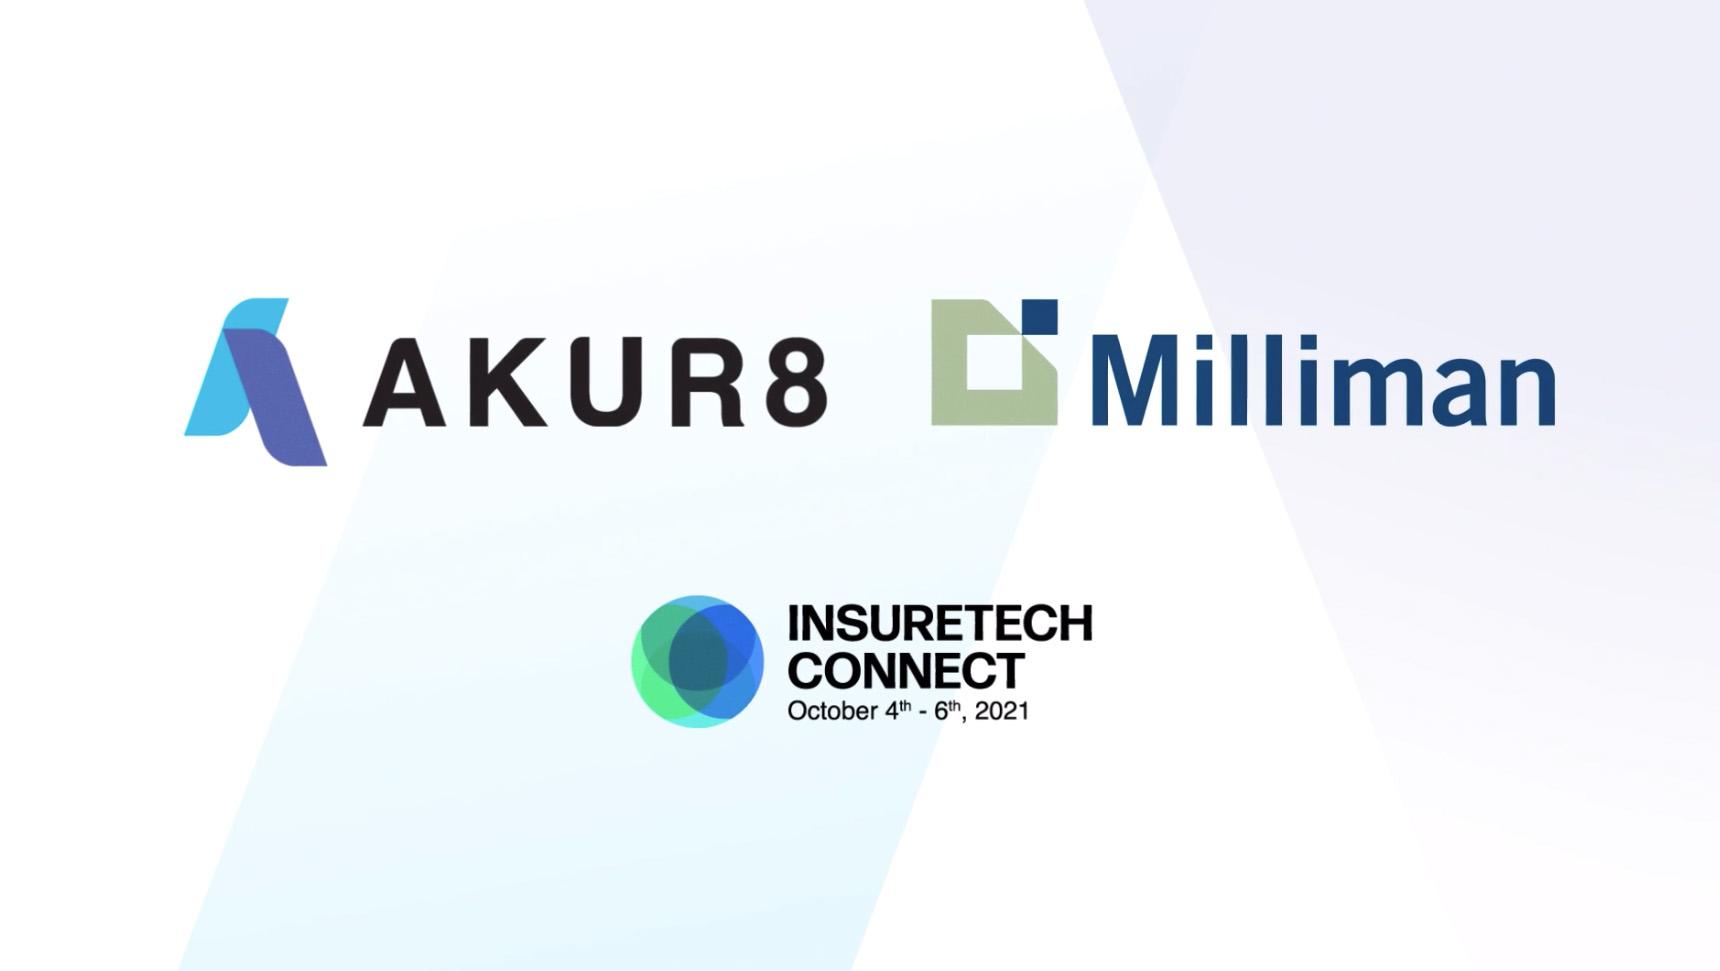 Akur8 and Milliman - Insuretech Connect Vegas 2021